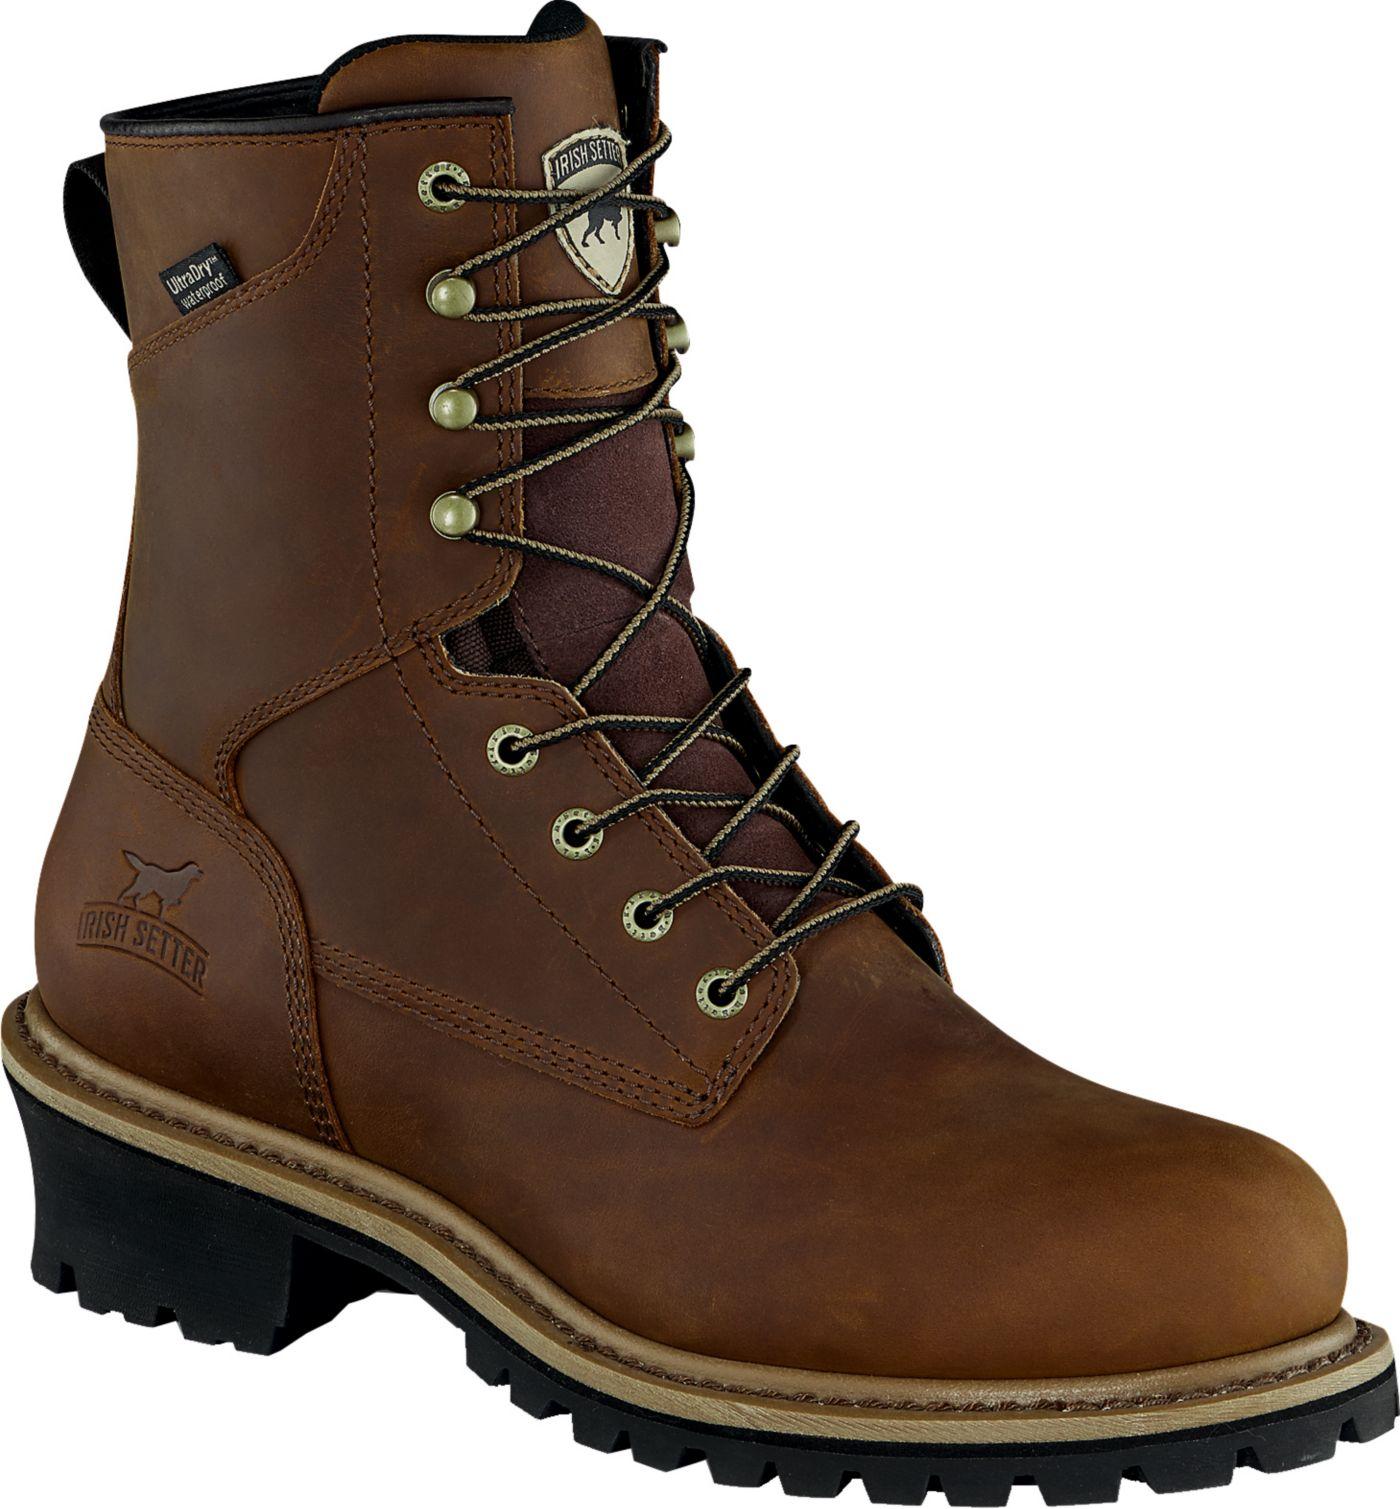 Irish Setter Men's Mesabi Logger 8'' Waterproof Steel Toe Work Boots